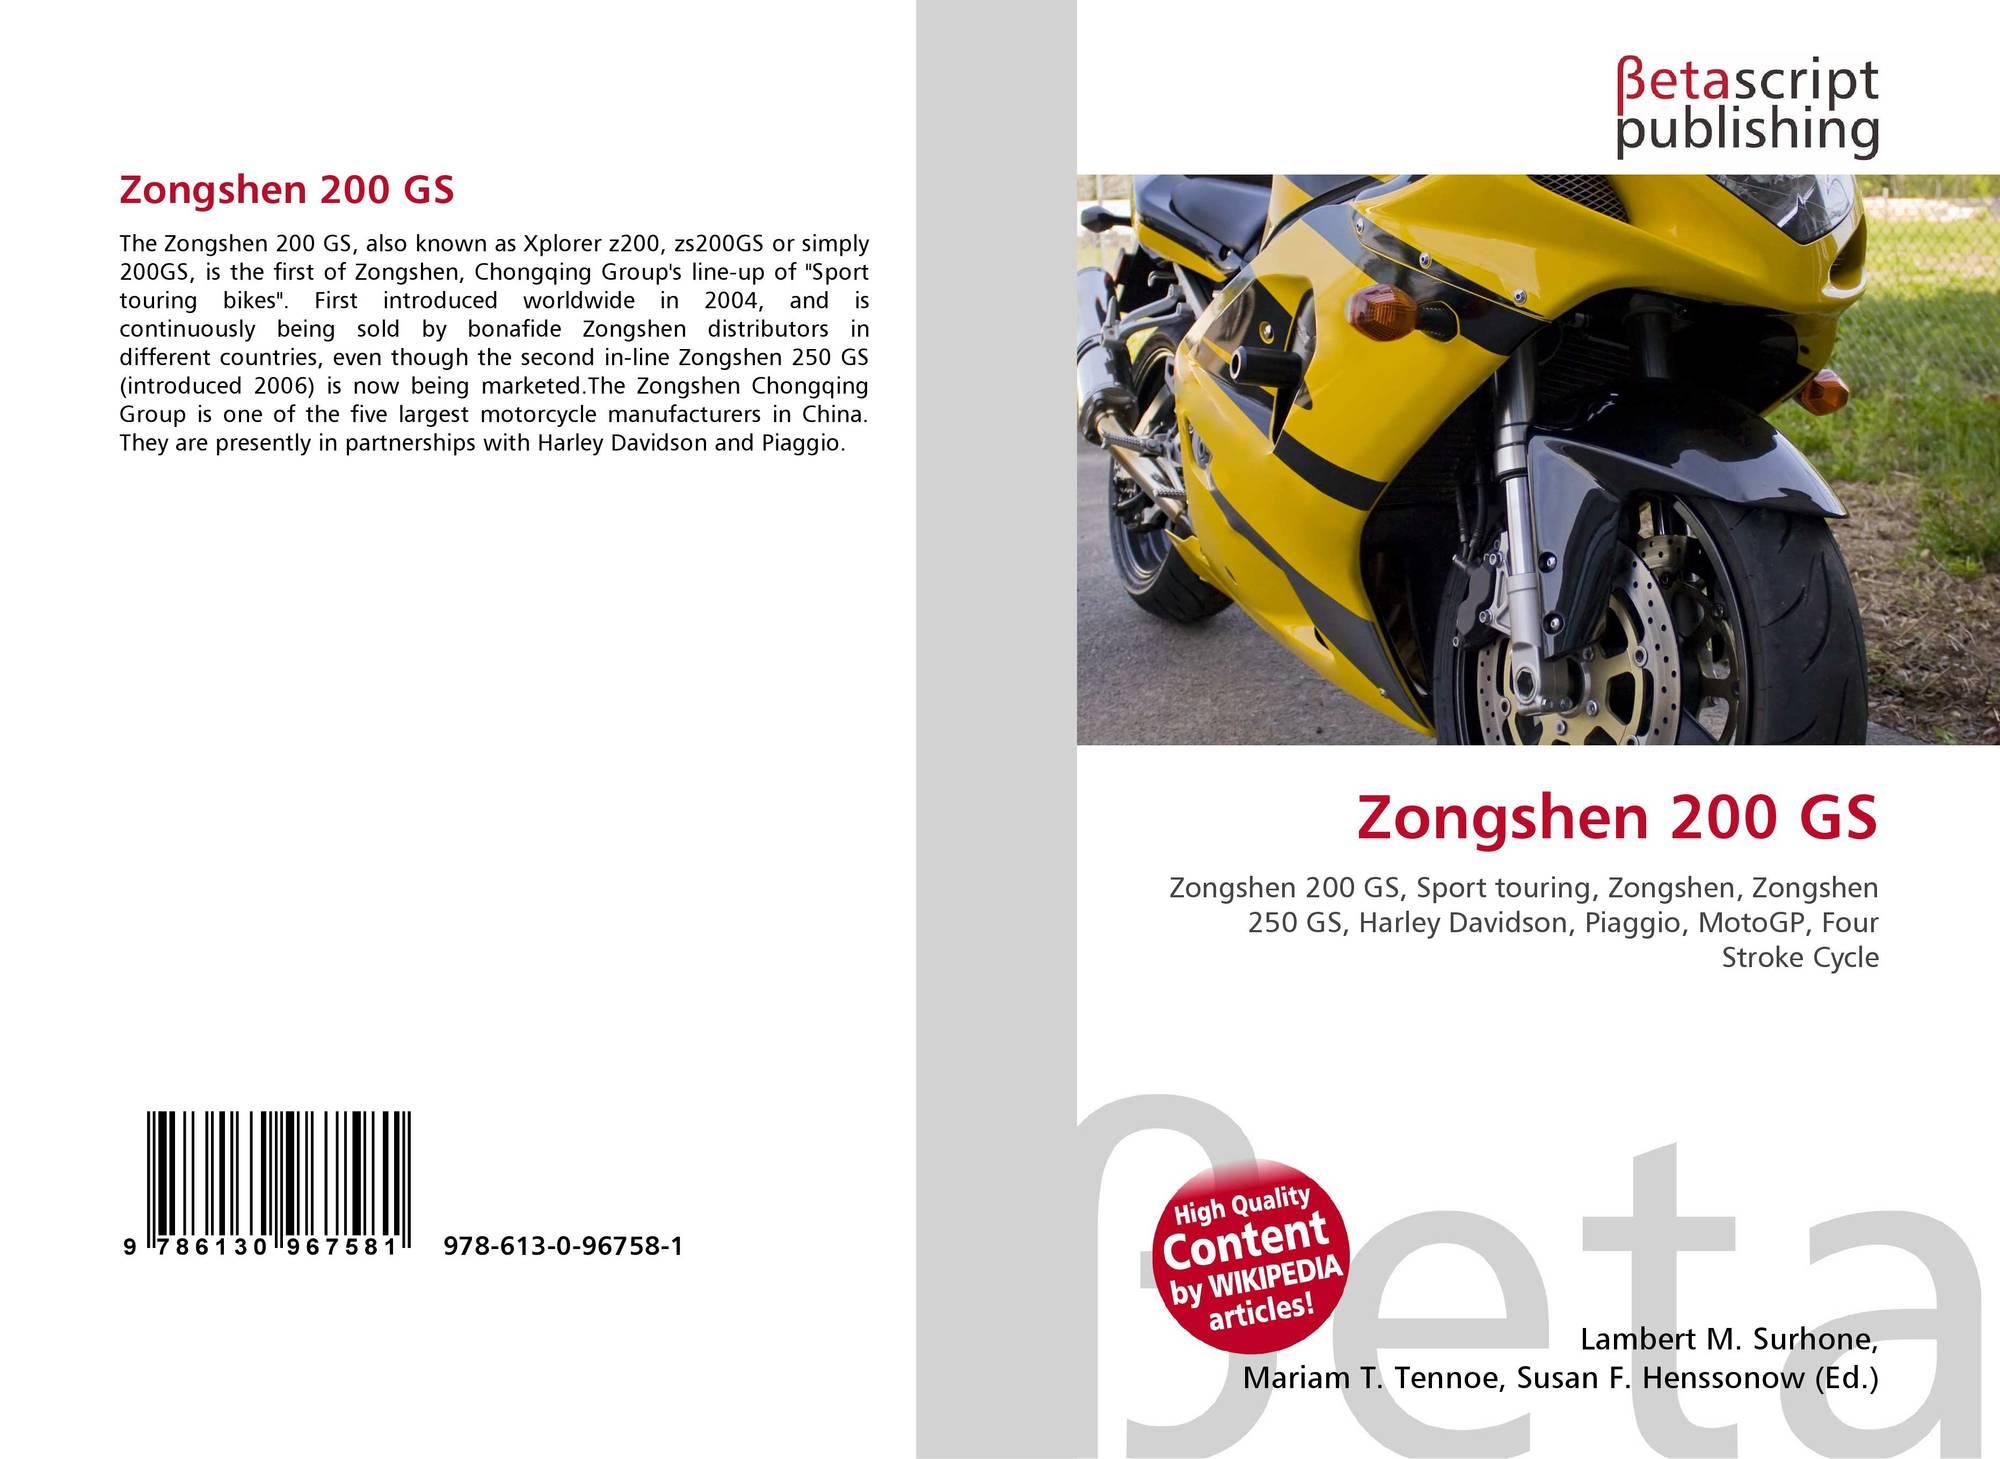 Zongshen 200 GS, 978-613-0-96758-1, 6130967586 ,9786130967581